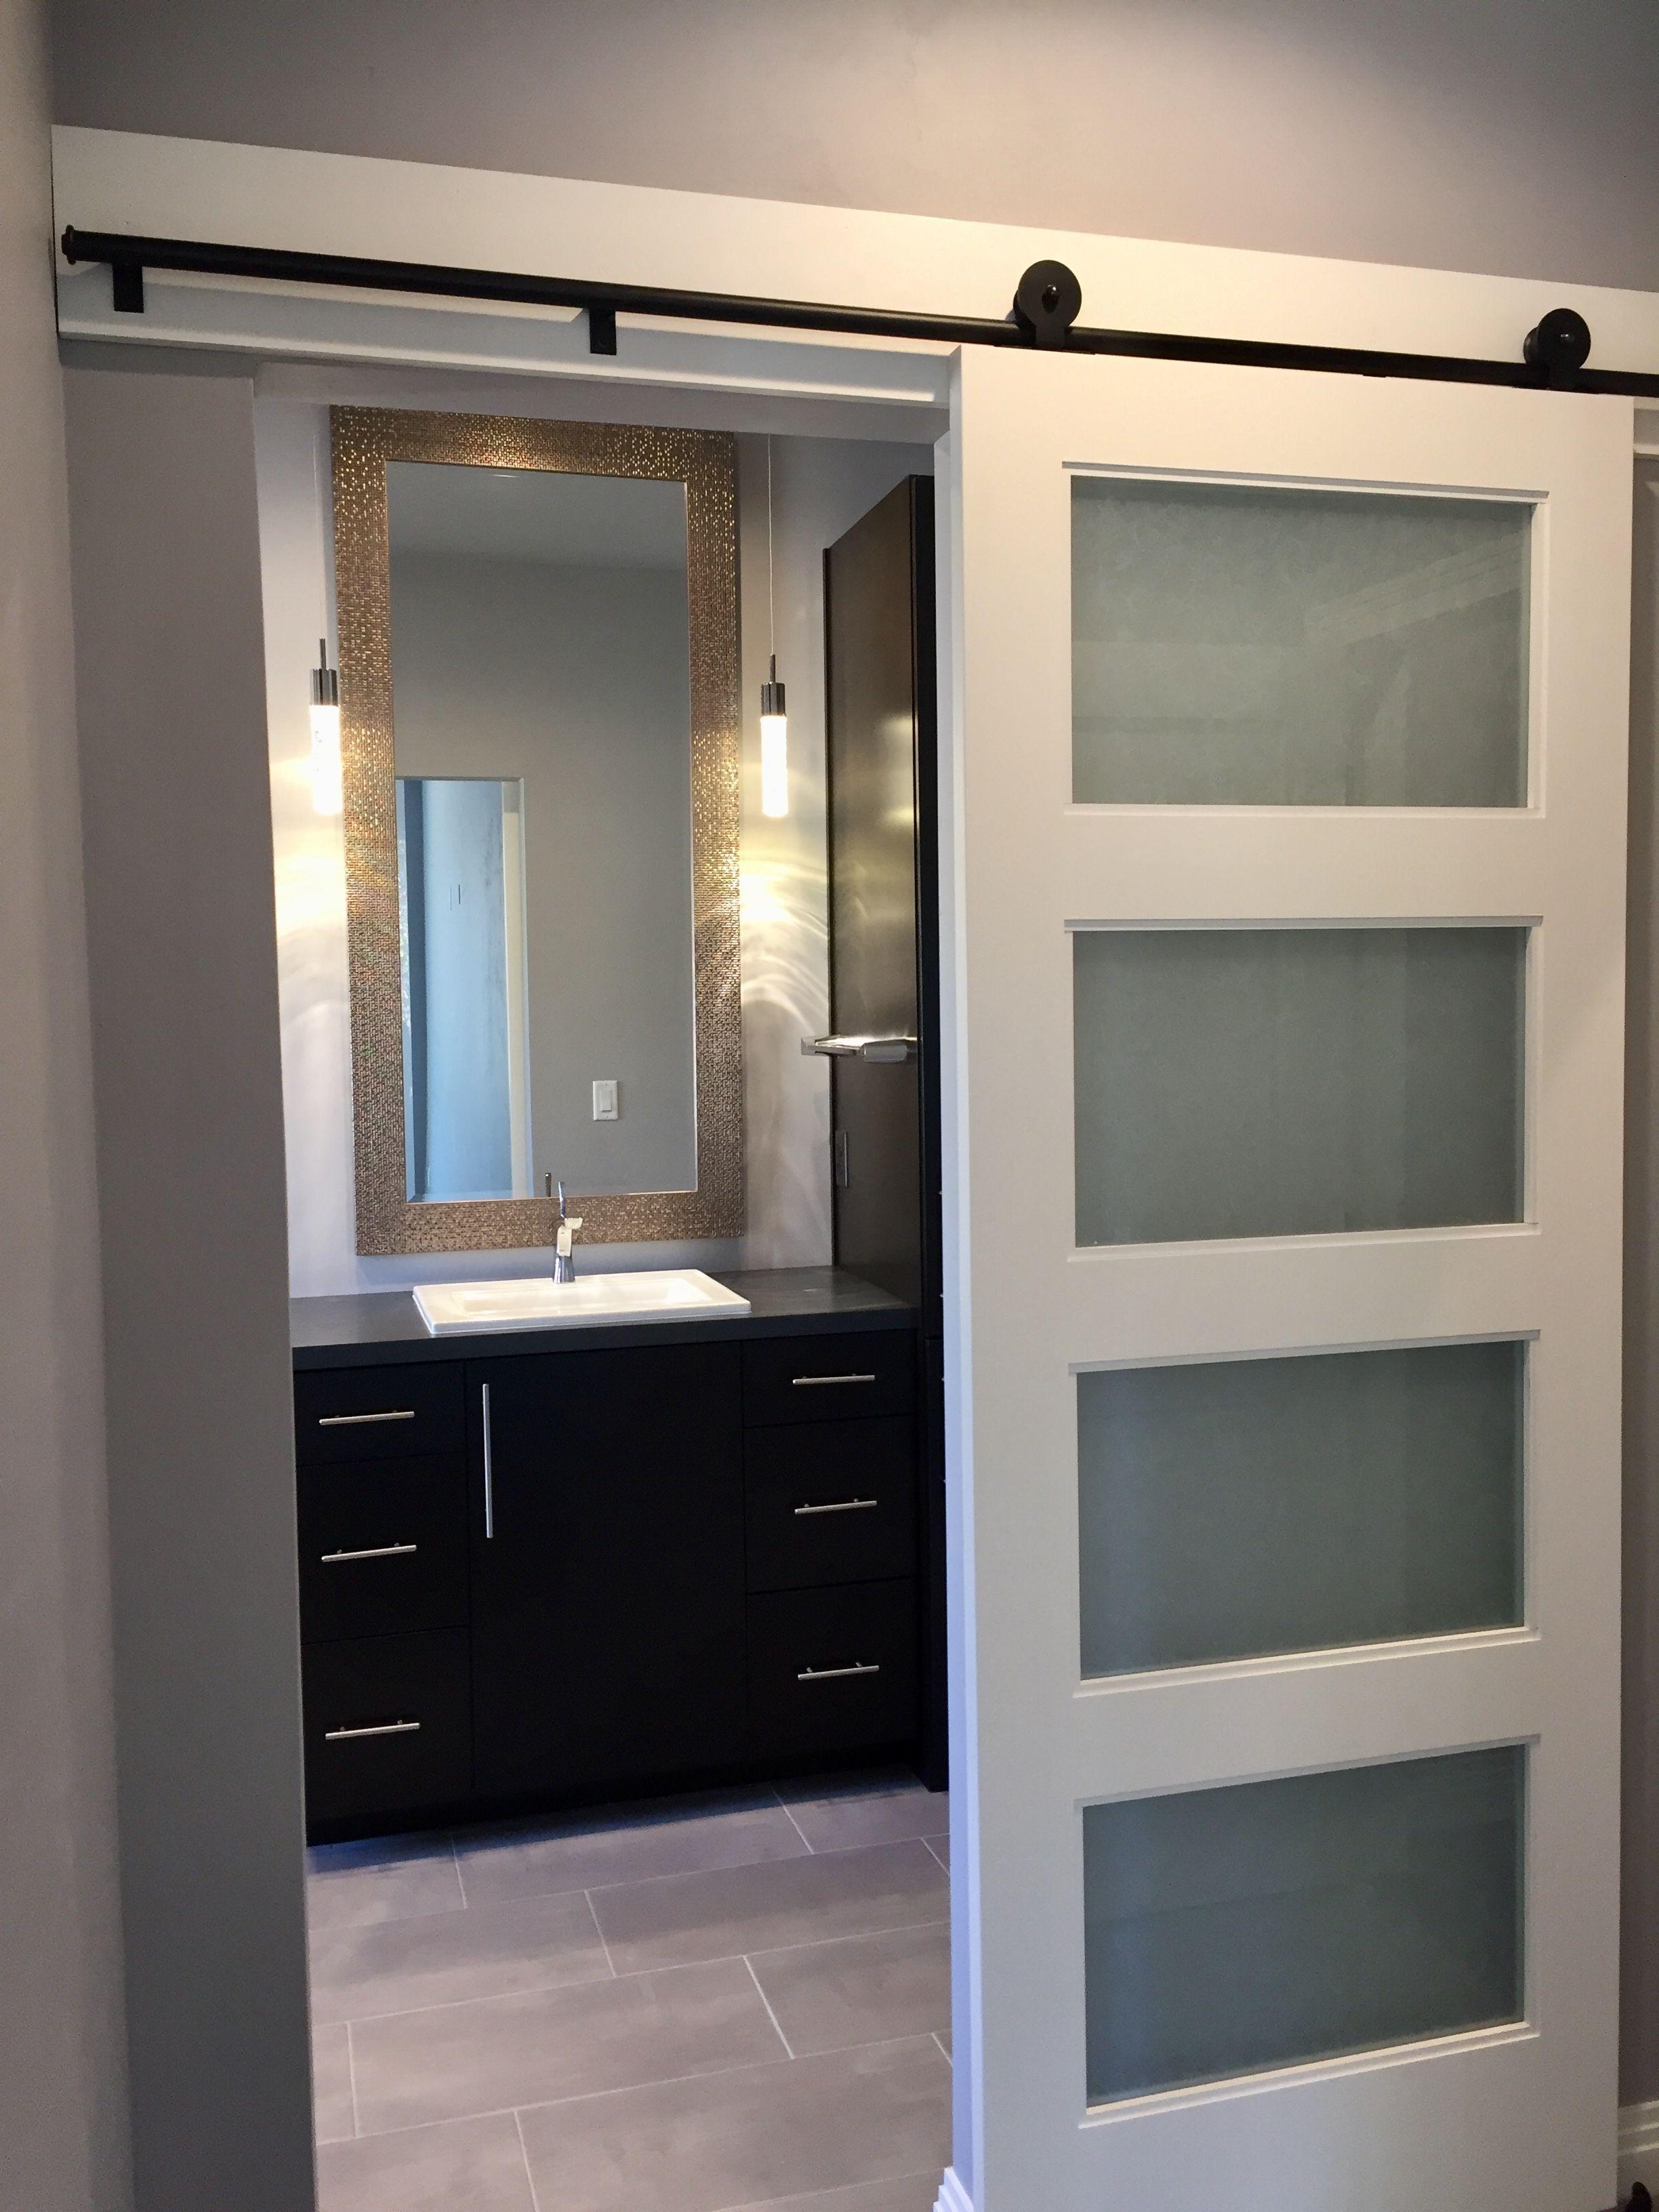 Contemporary Bathroom With A Modern Style Sliding Door Including Rice Paper Glass Panels Sleek Style Pendant Lig Bathrooms Remodel Modern Barn Door Glass Door